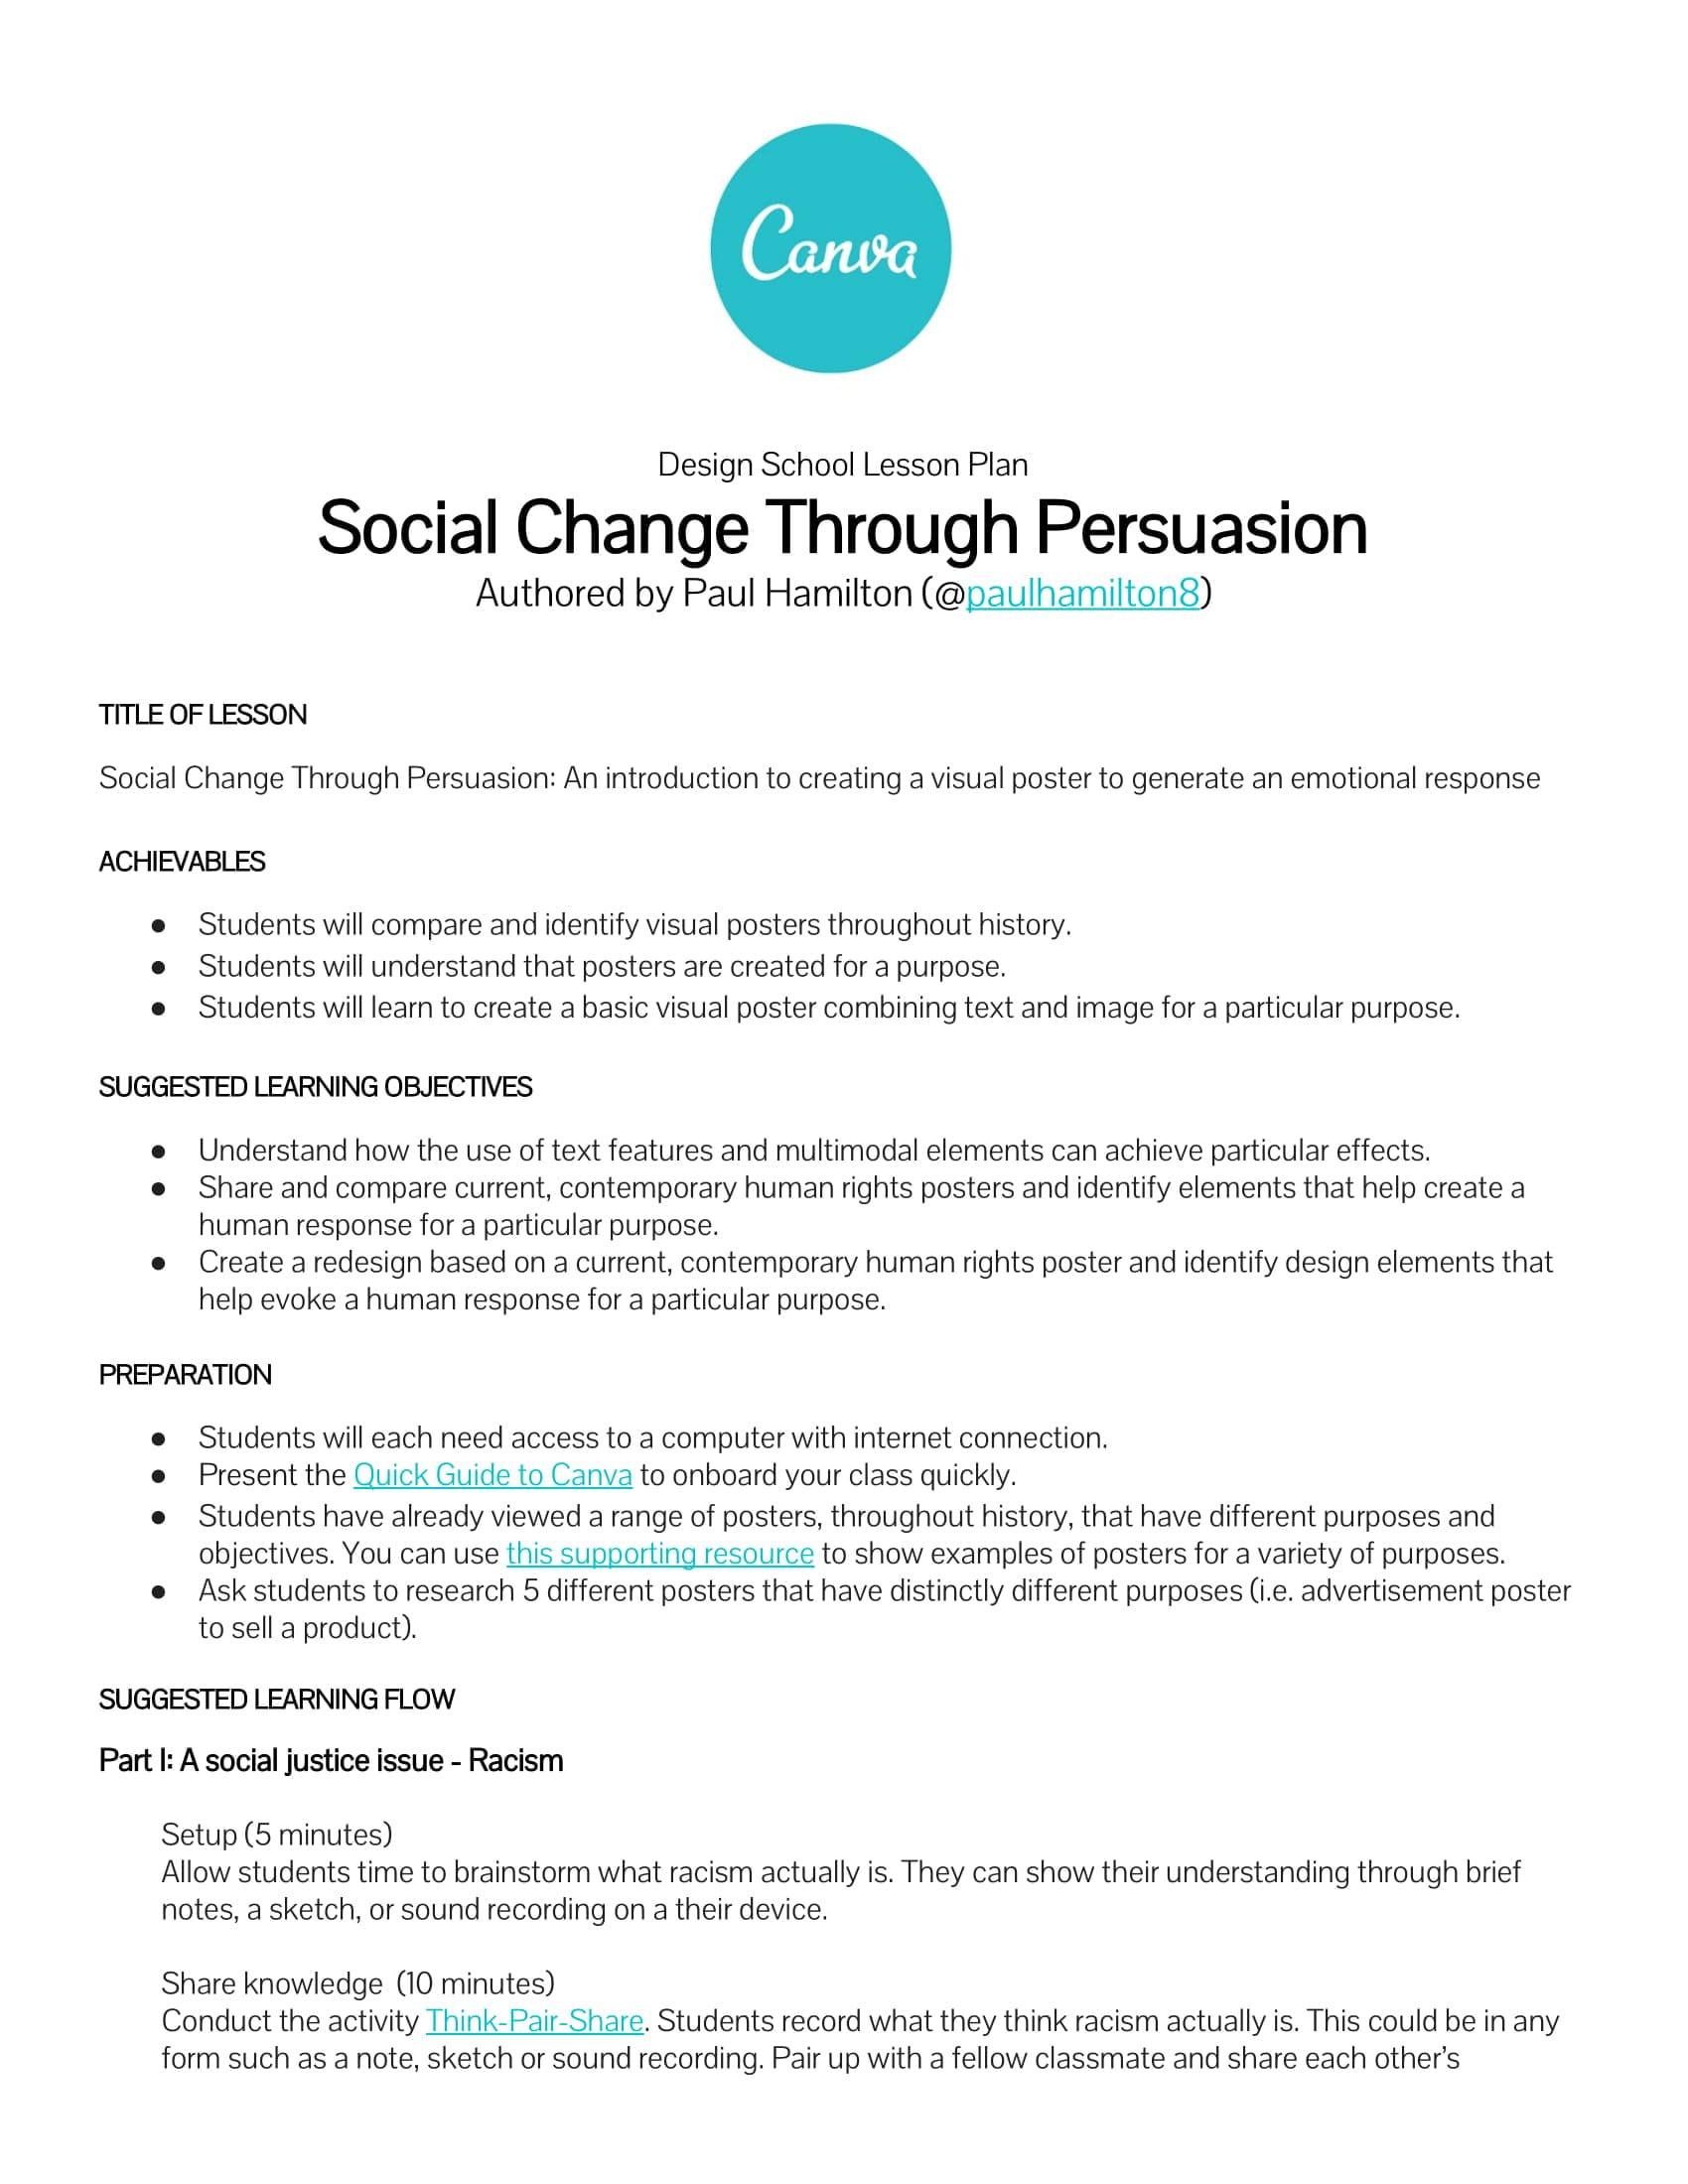 Social_Change_Through_Persuasion